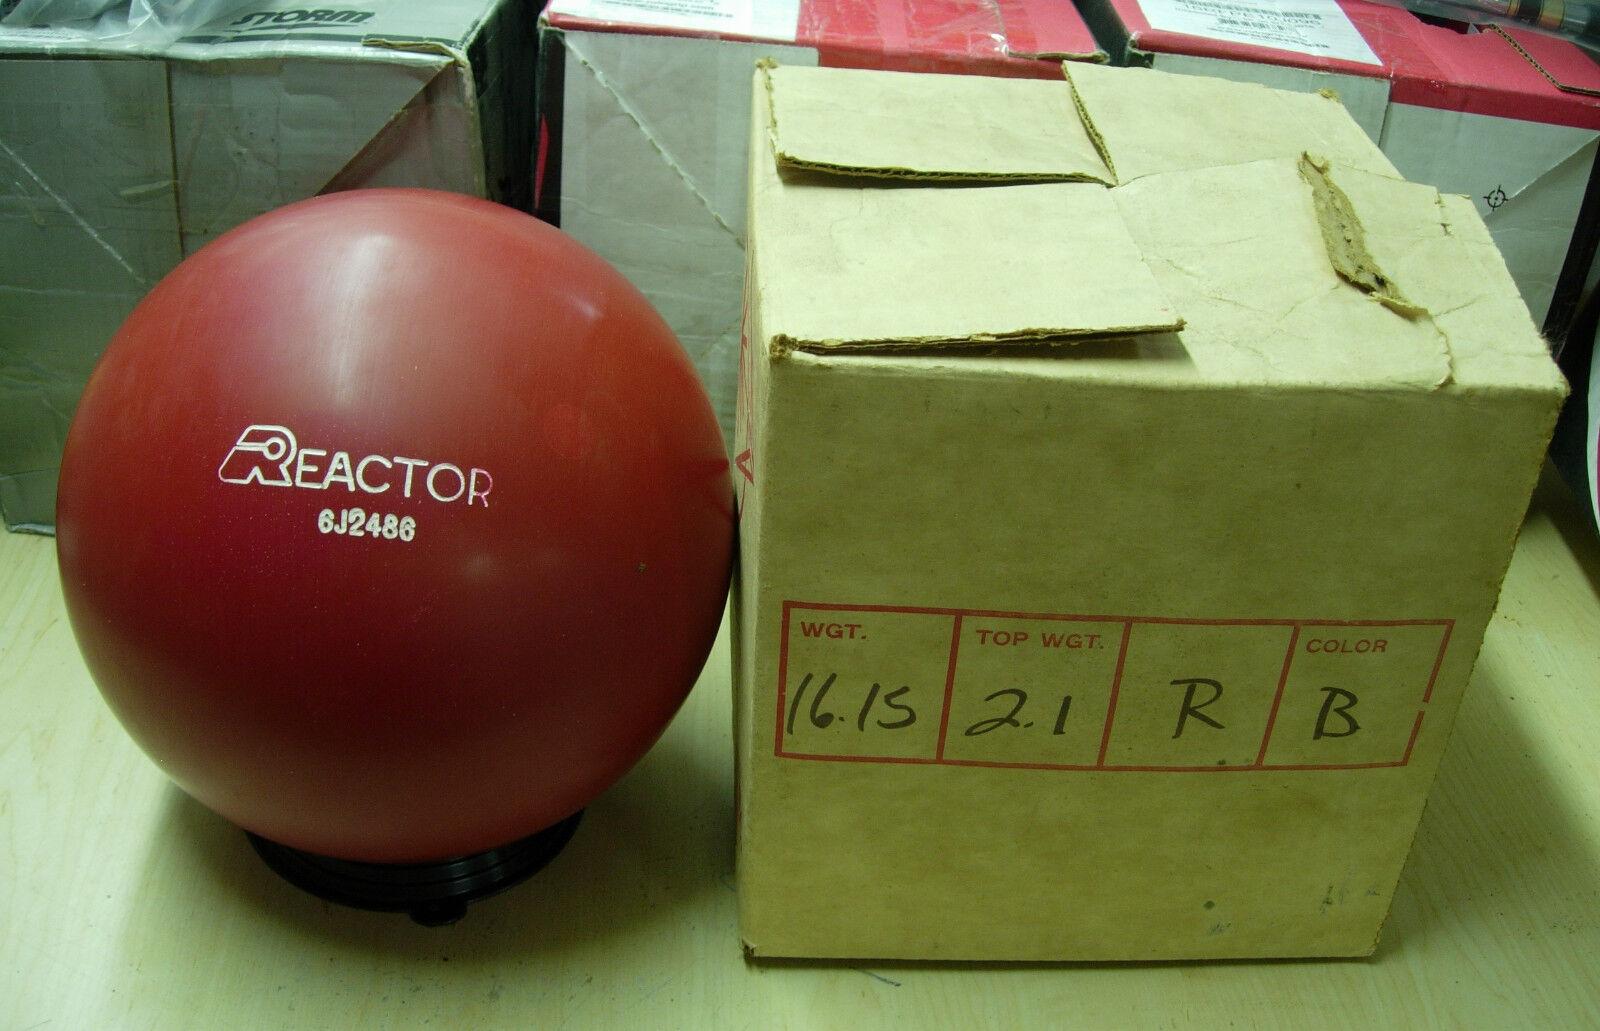 = 16.15, TW 2.1 Star Trak 1986 REACTOR Urethane Red Solid